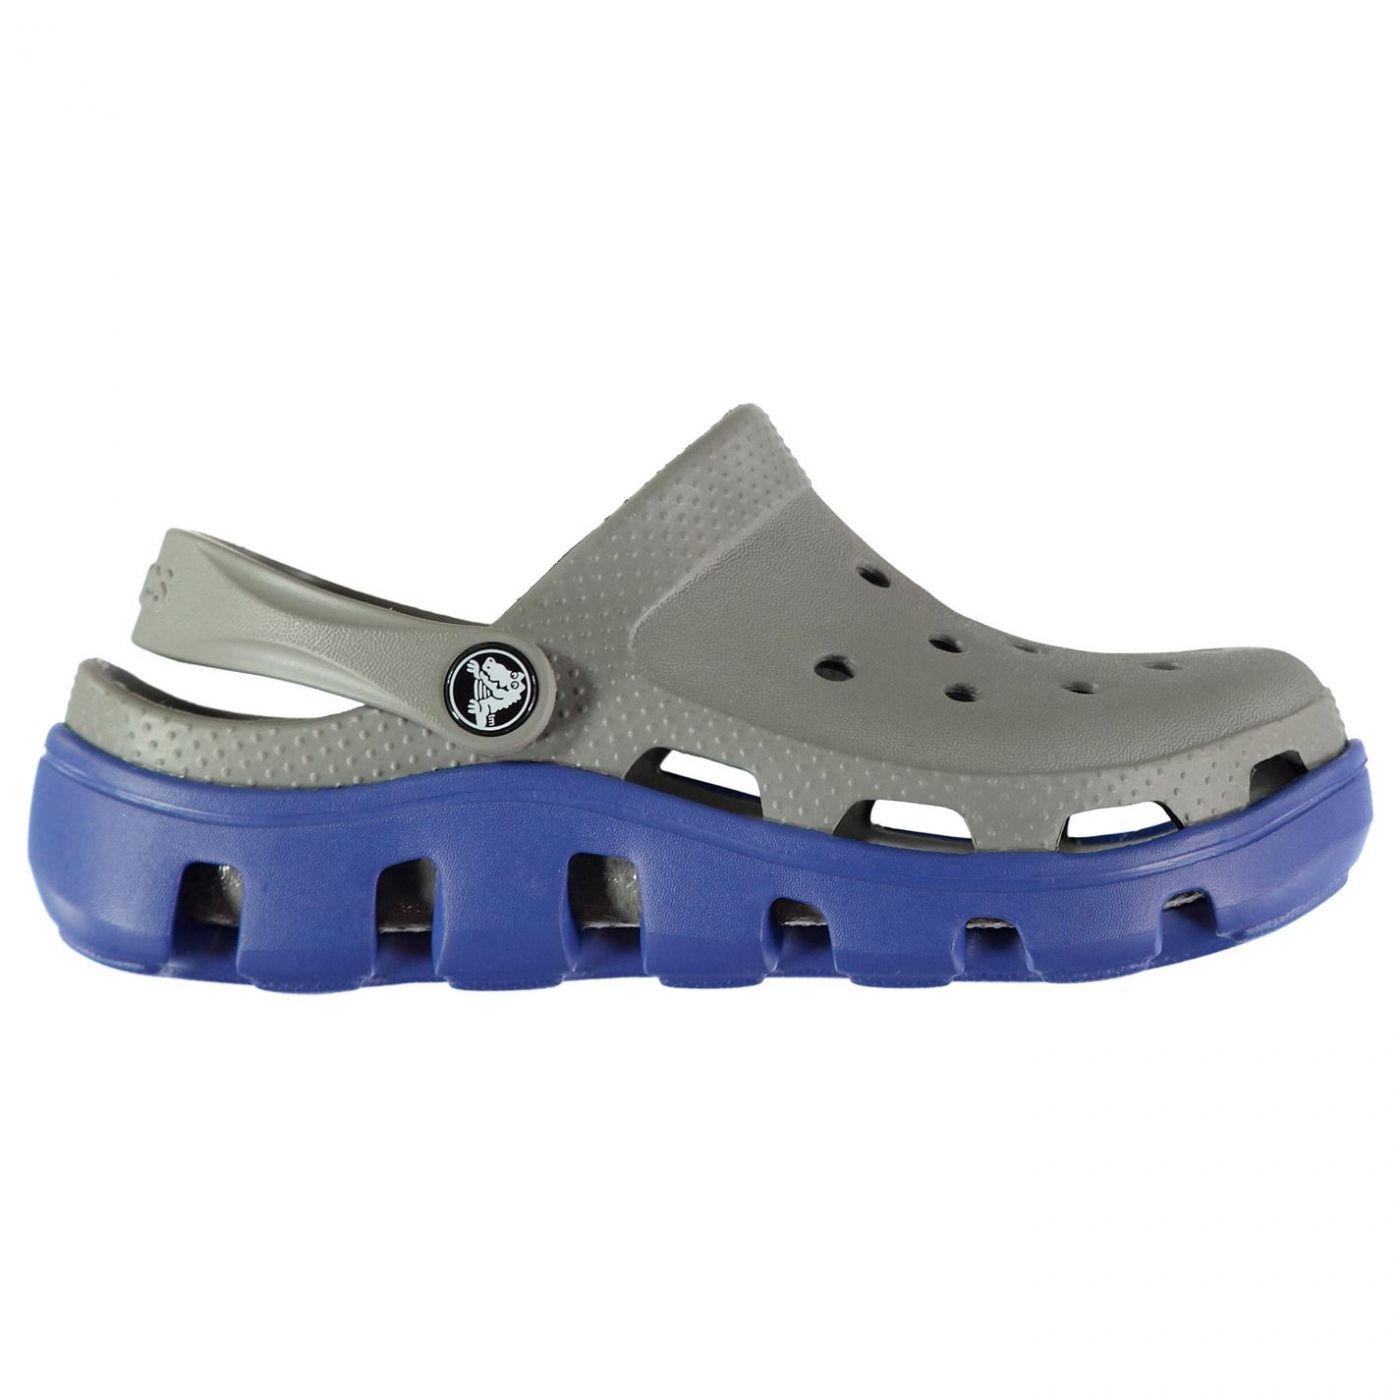 Crocs Duet Sport Child Boys Sandals